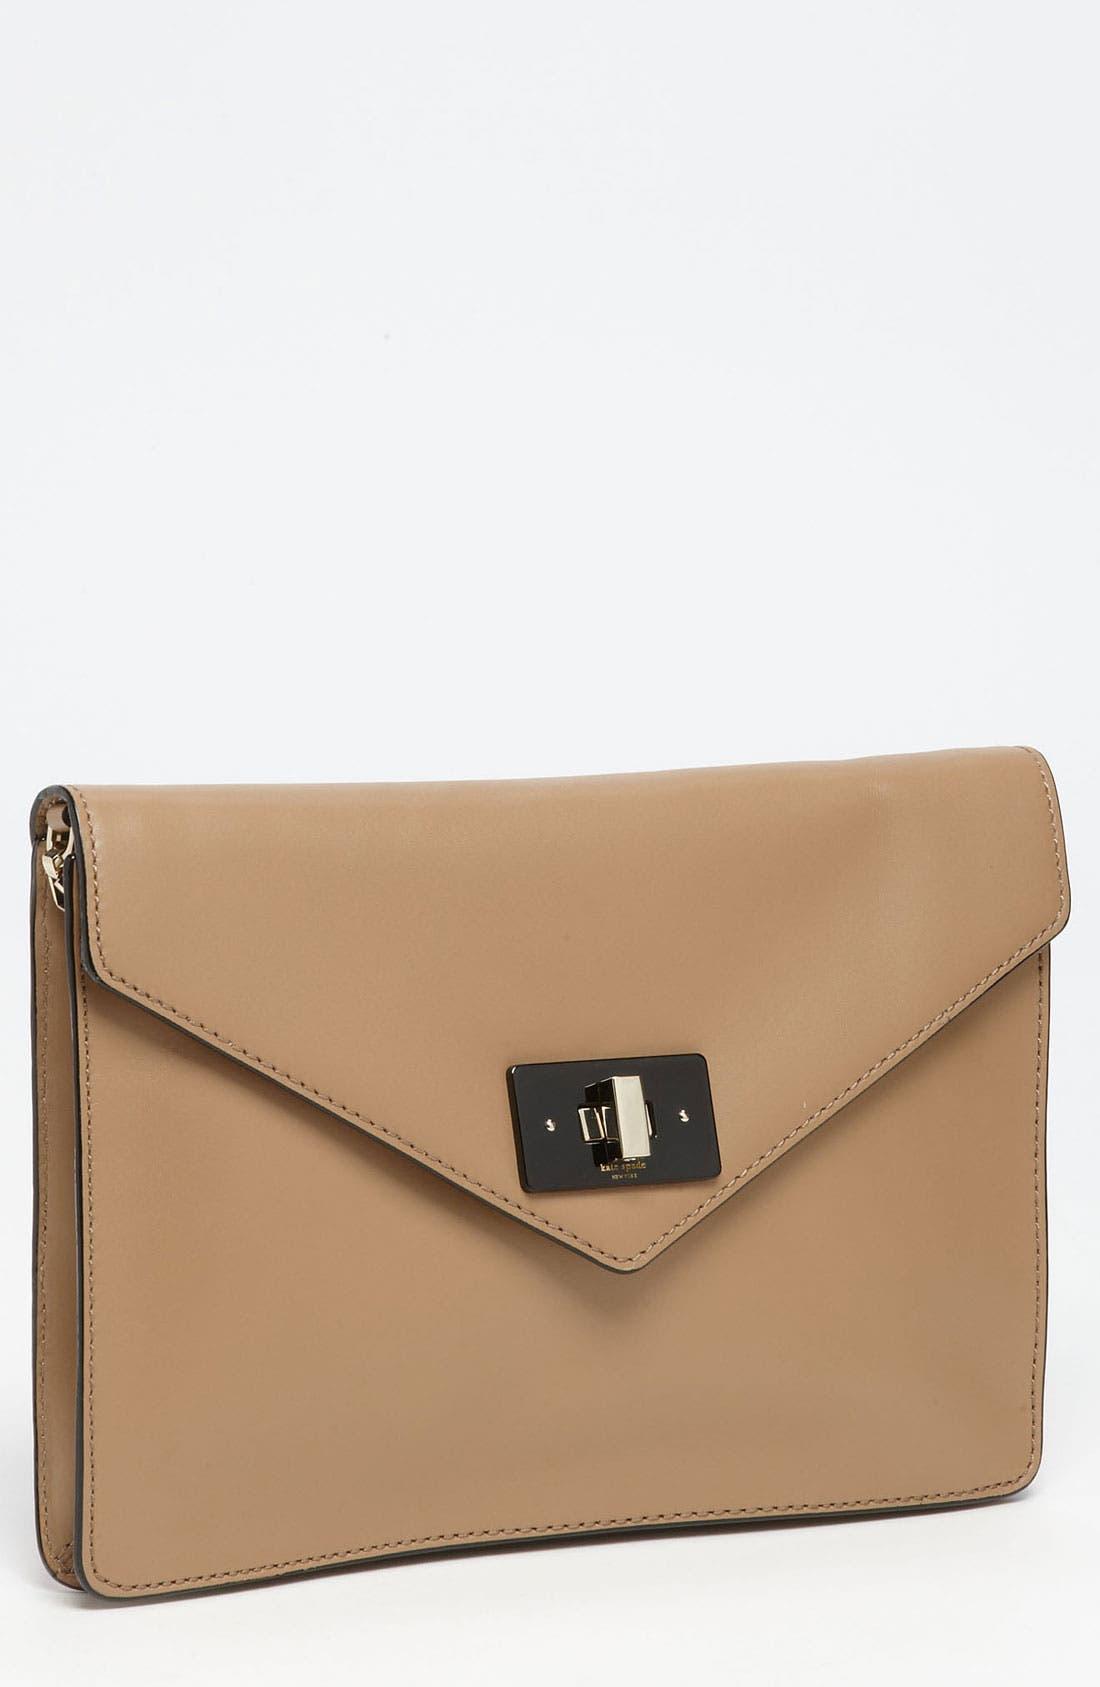 Main Image - kate spade new york 'post street - madison' shoulder bag